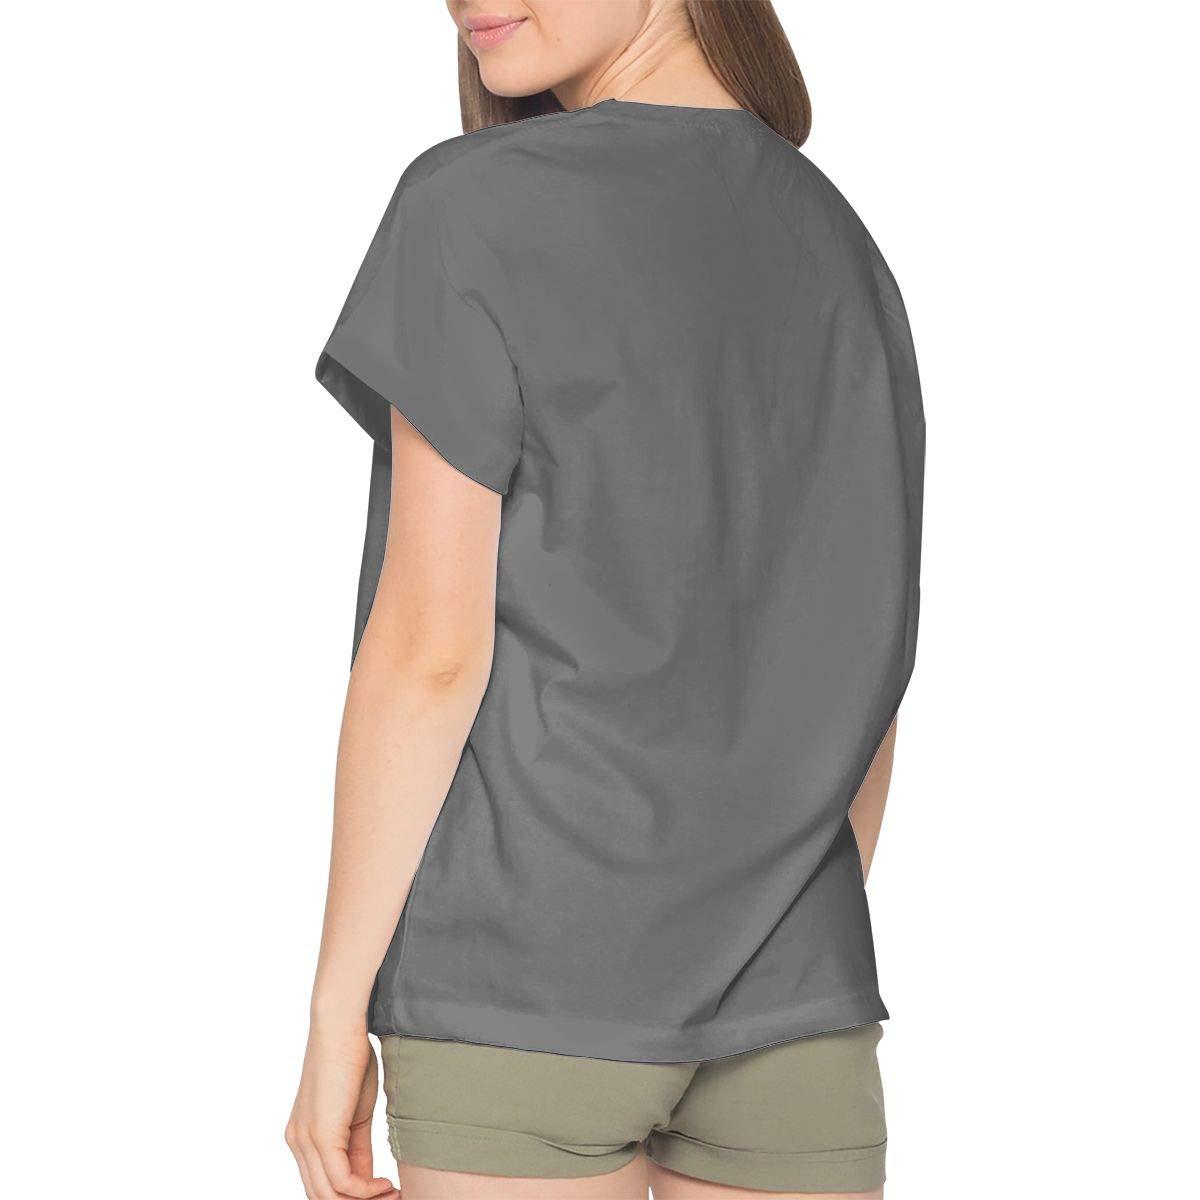 Maria M Arnold CNCO-Hey DJ Mens Popular Short Sleeve Music Band Shirt Black